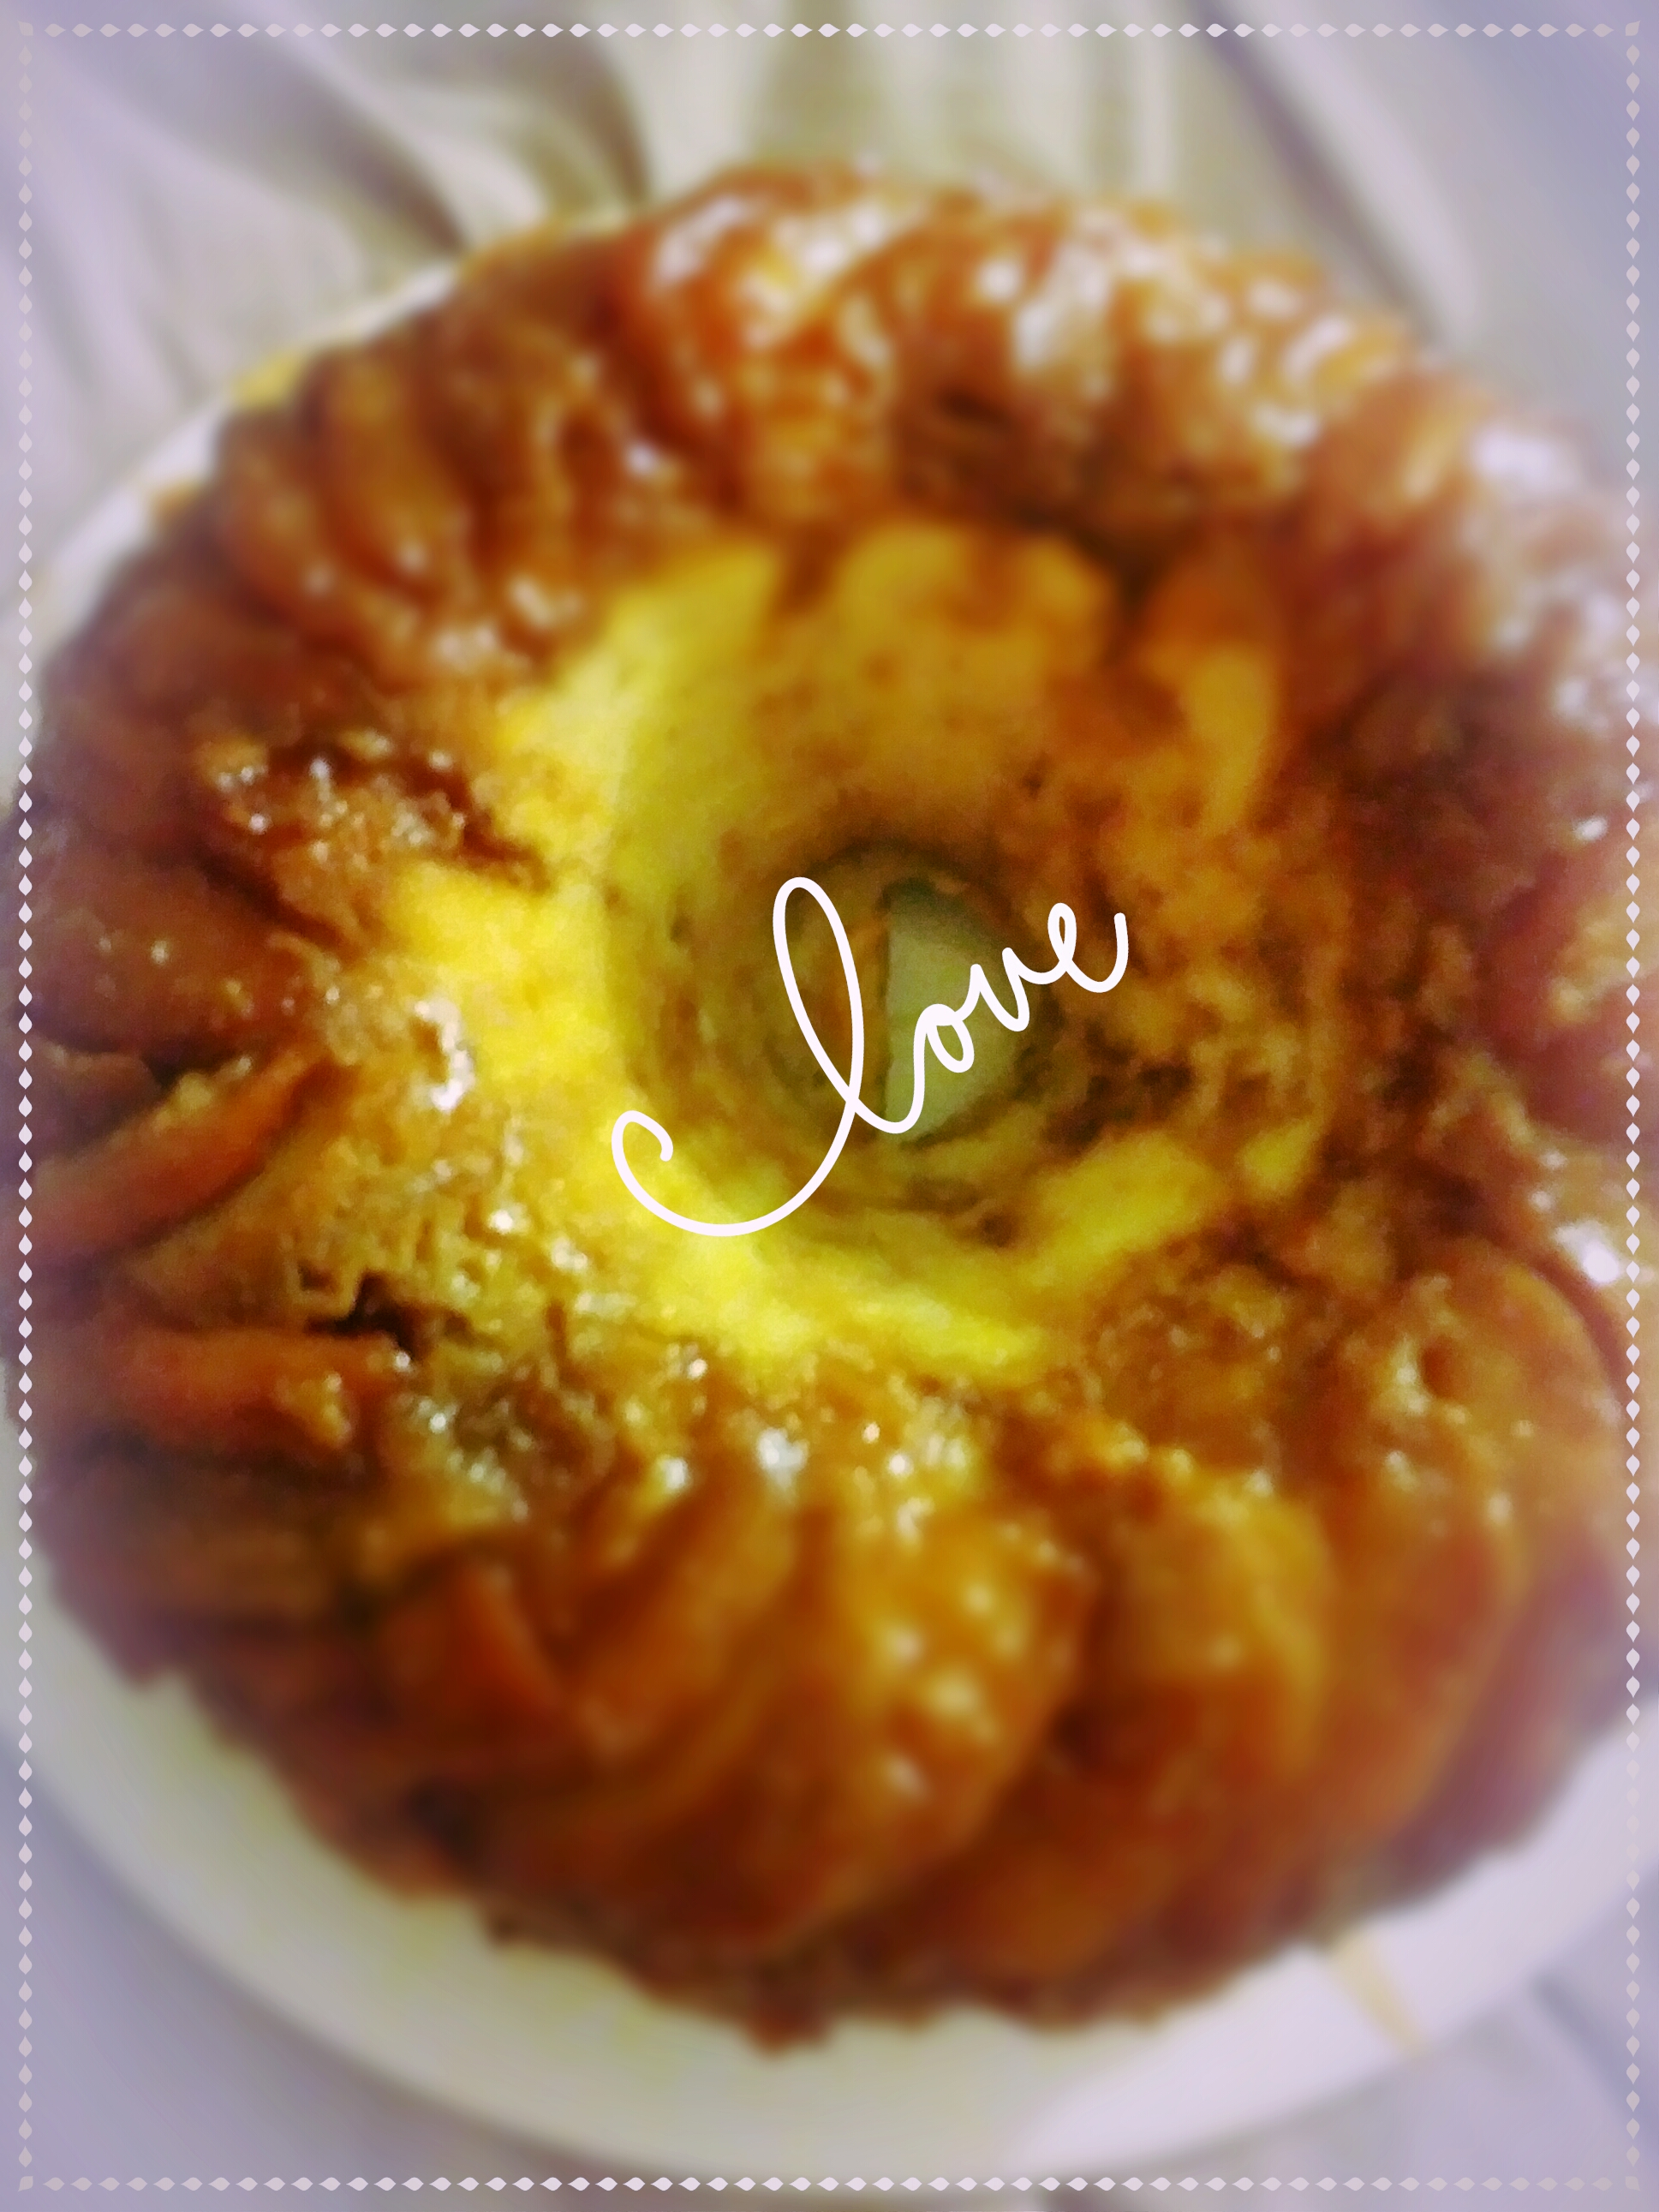 Peach Cobbler Upside-Down Pound Cake